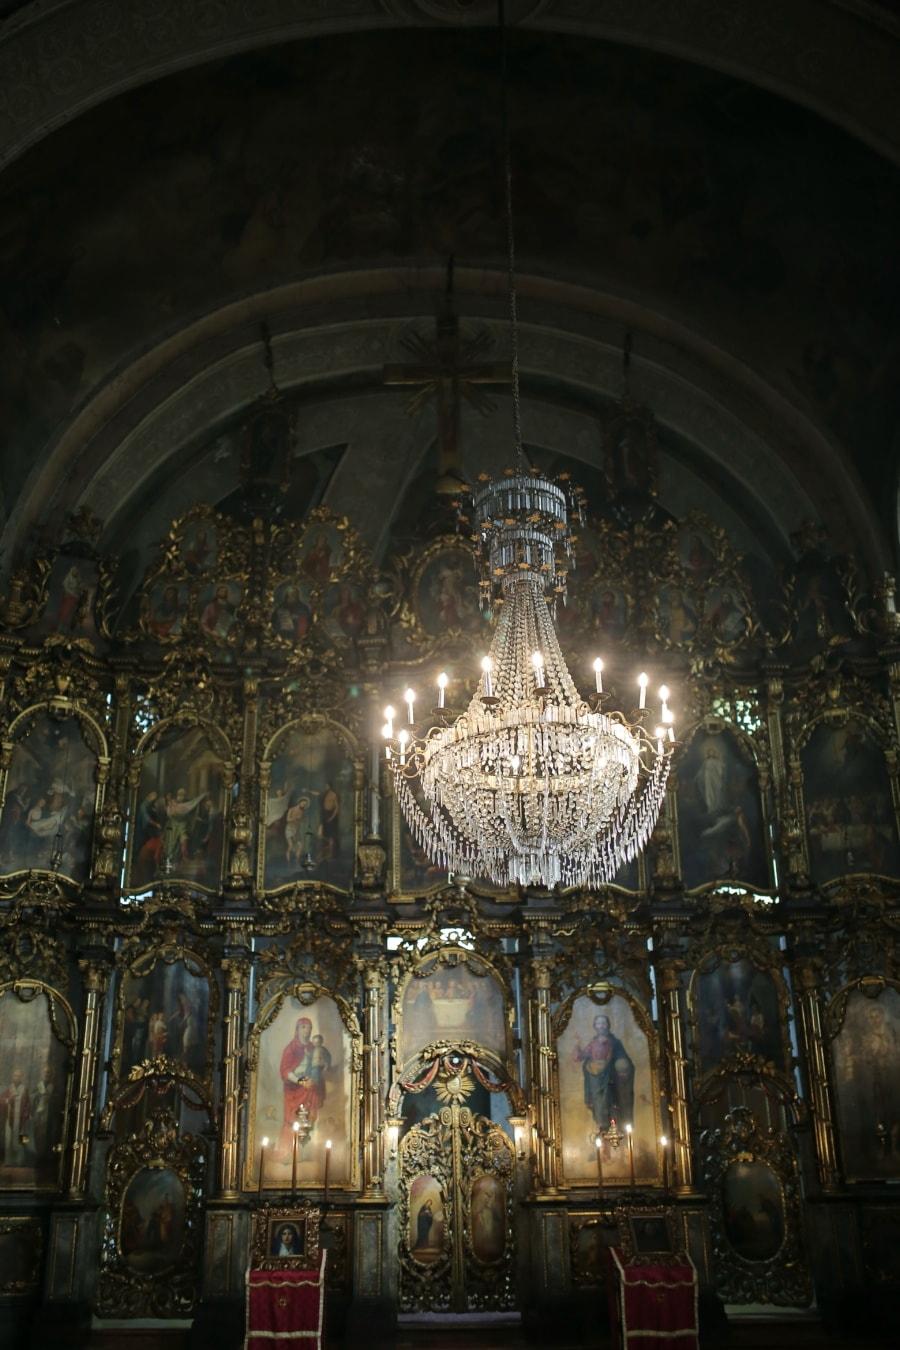 Ucrania, ortodoxa, Iglesia, altar, cristianismo, interior, araña de luces, cristal, arquitectura, estructura